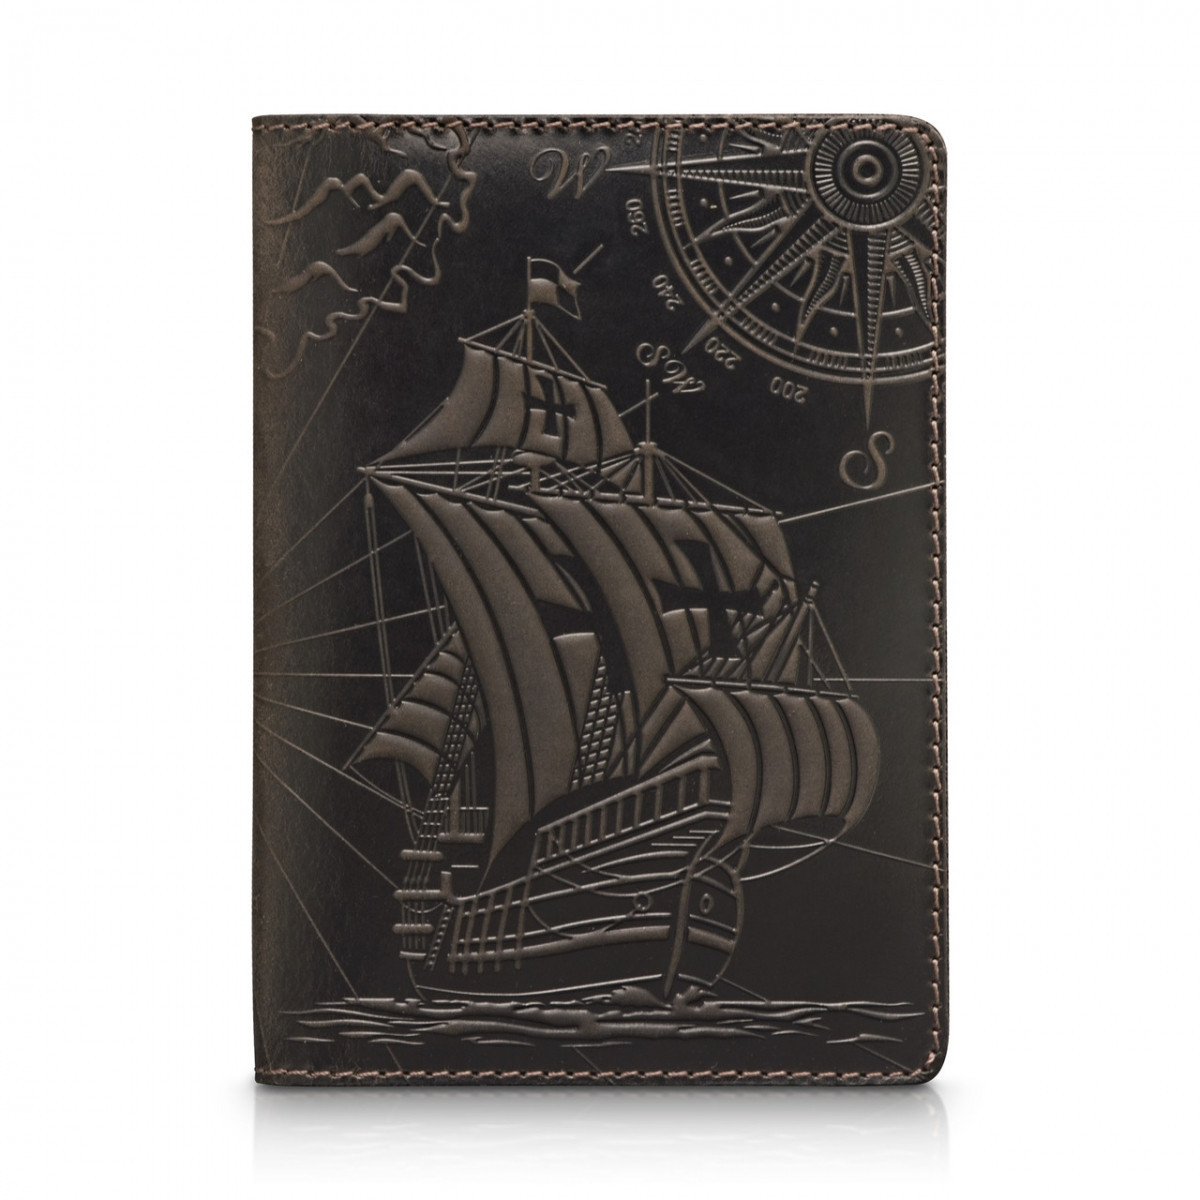 Обложка для паспорта HiArt Shabby Gavana Brown Discoveries